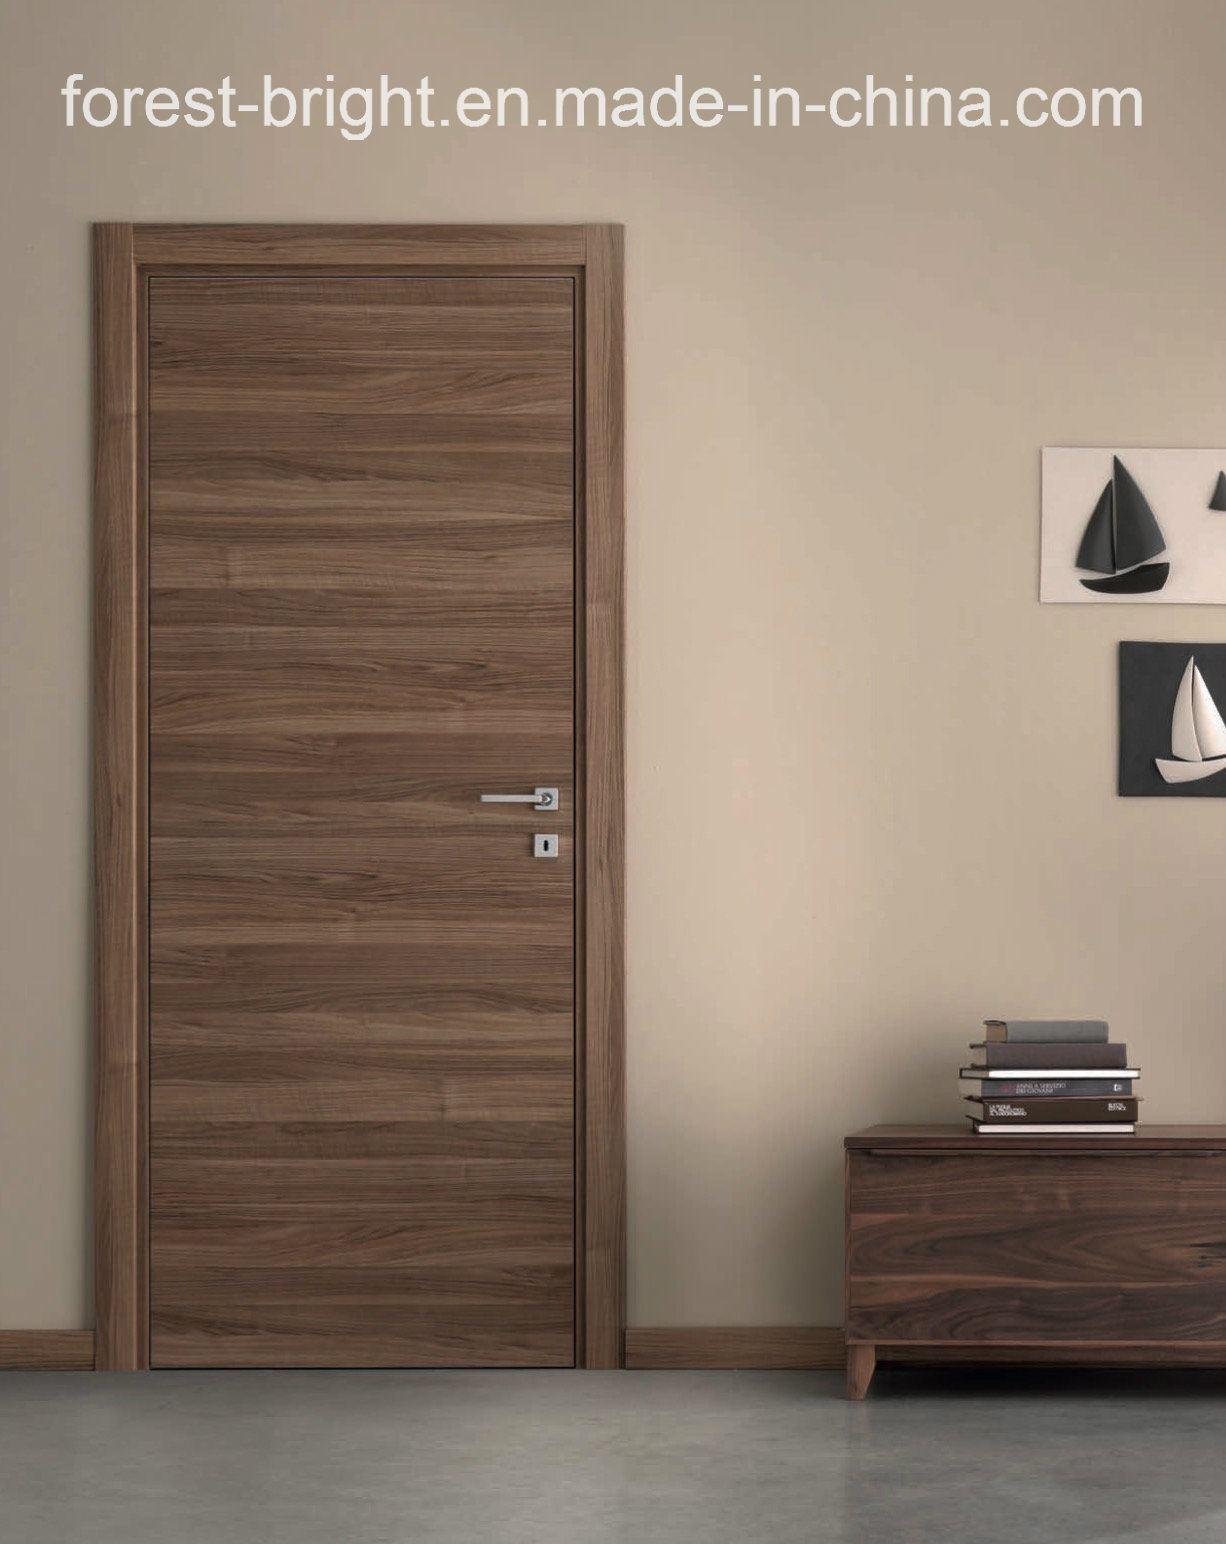 bedroom door designs in wood pakistan ideas sliding doors sweet dreams cool  decorating modern nice for